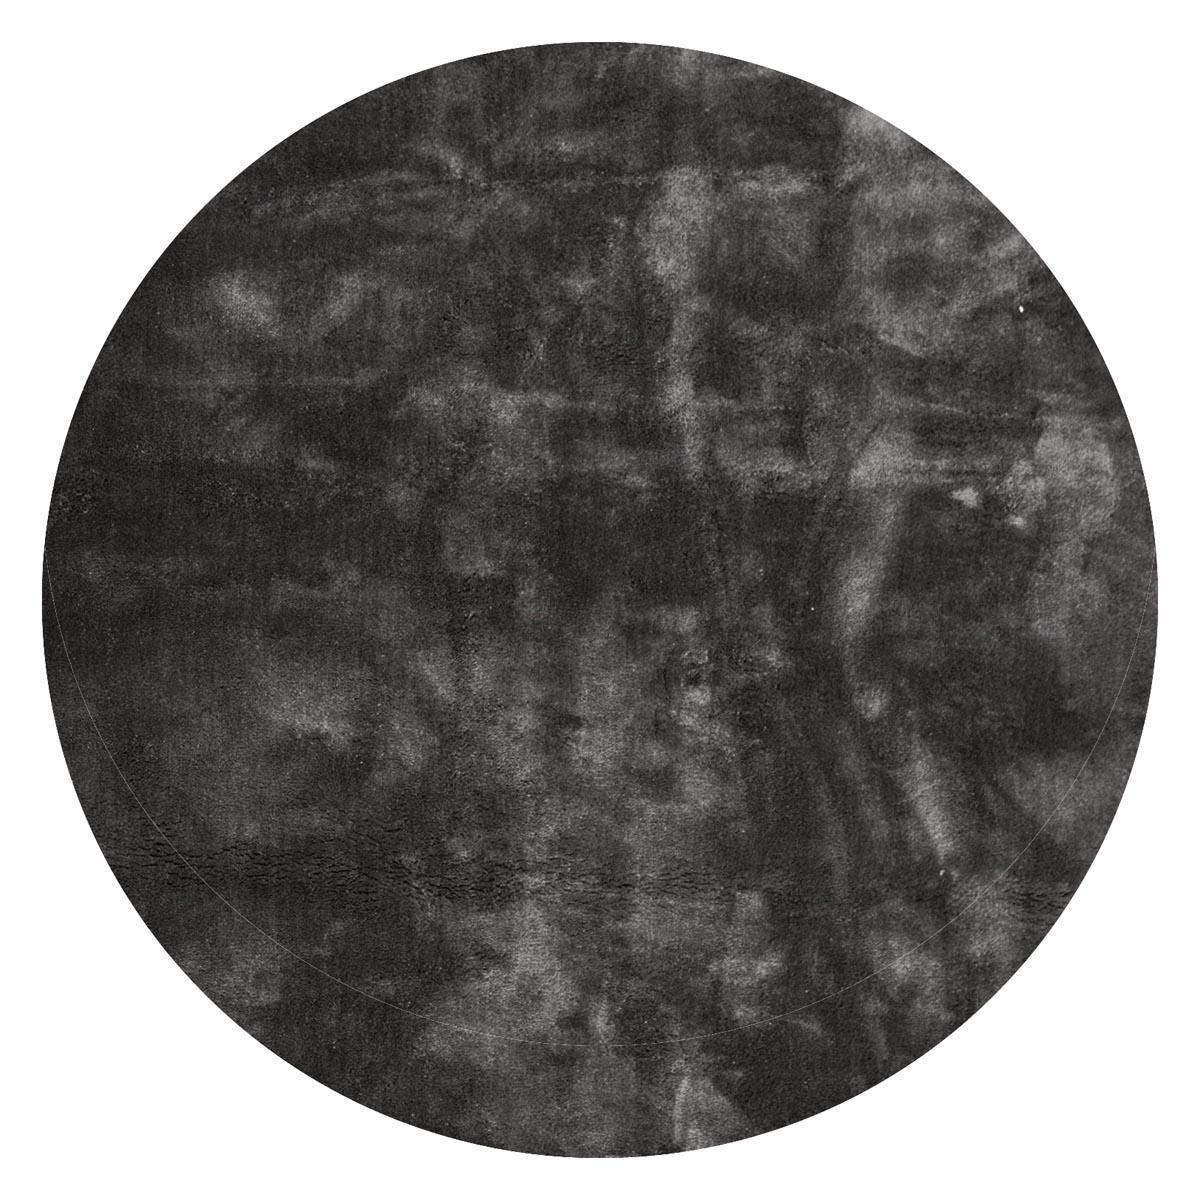 Undra matta rund mörkgrå